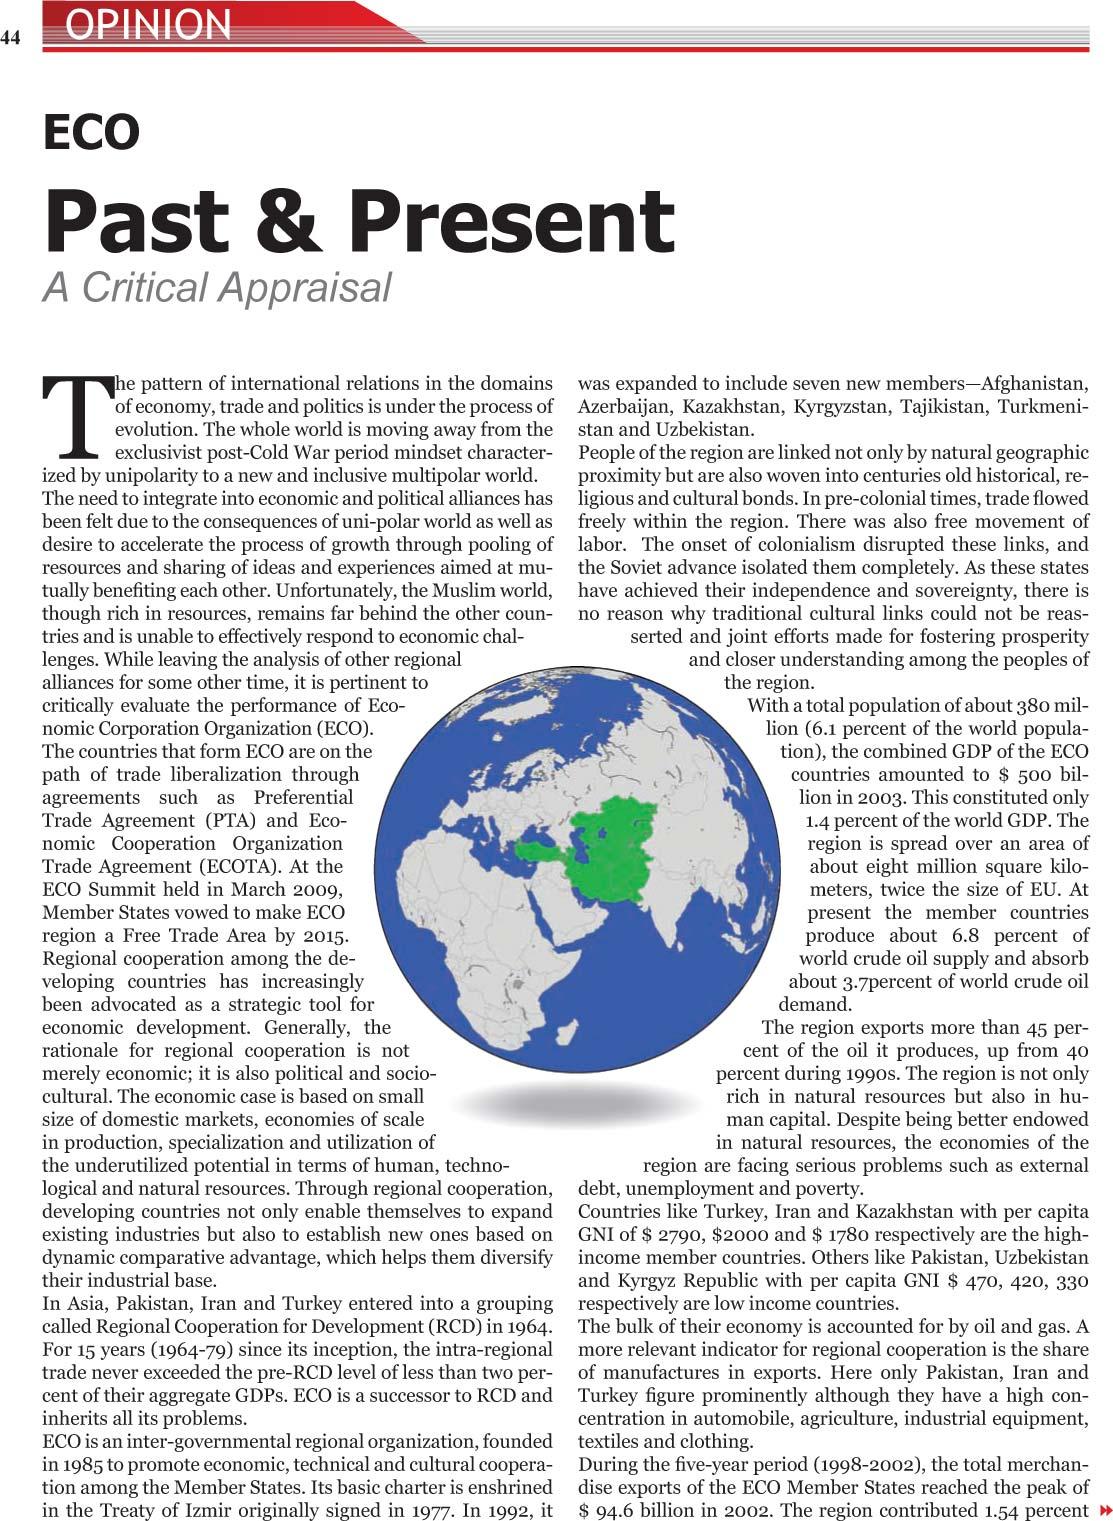 Minhaj-ul-Quran  Print Media CoverageMonthaly ECO Times July 2009